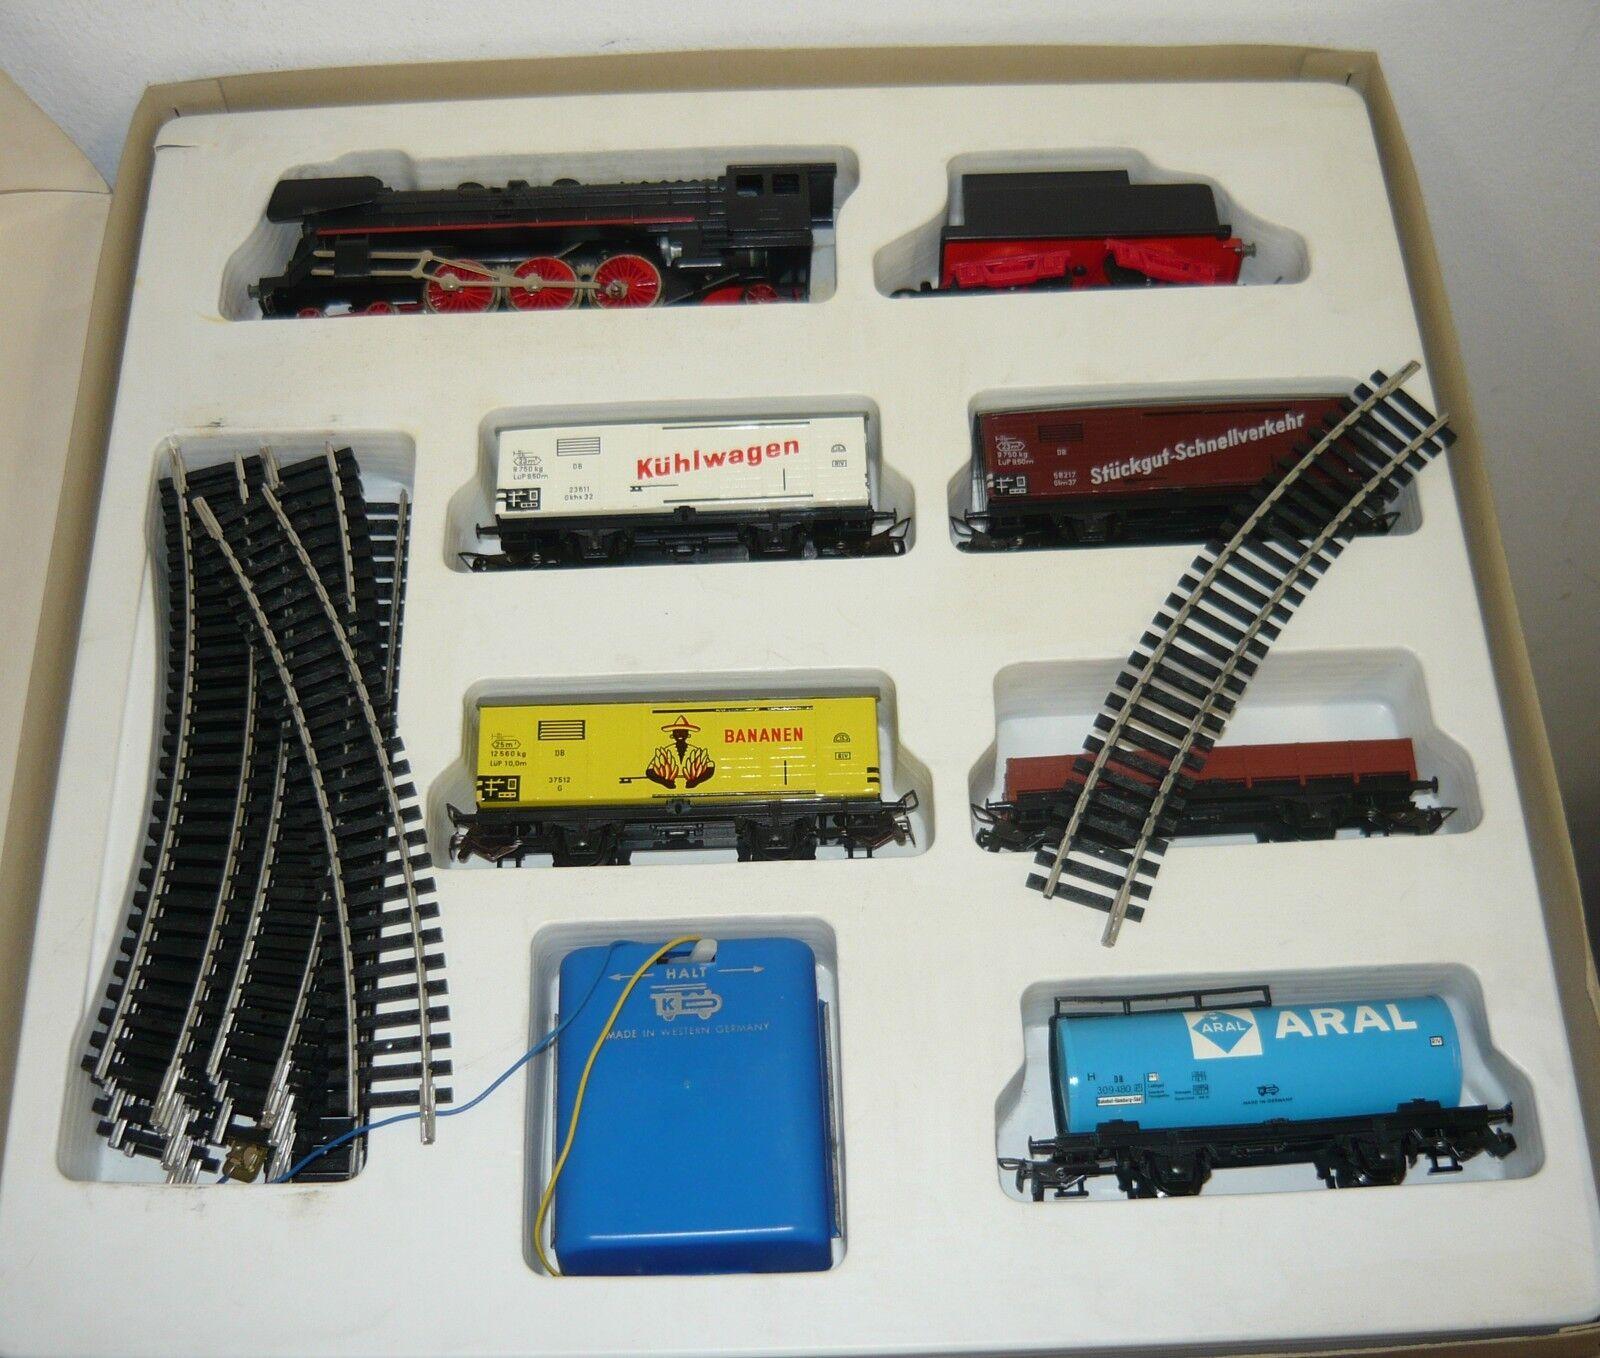 KD, Kaufhausbahn-Set mit Lok, Tender, 5 GüWa,Oval & Reg.,ca. 60er J,H0,gebr.&OVP